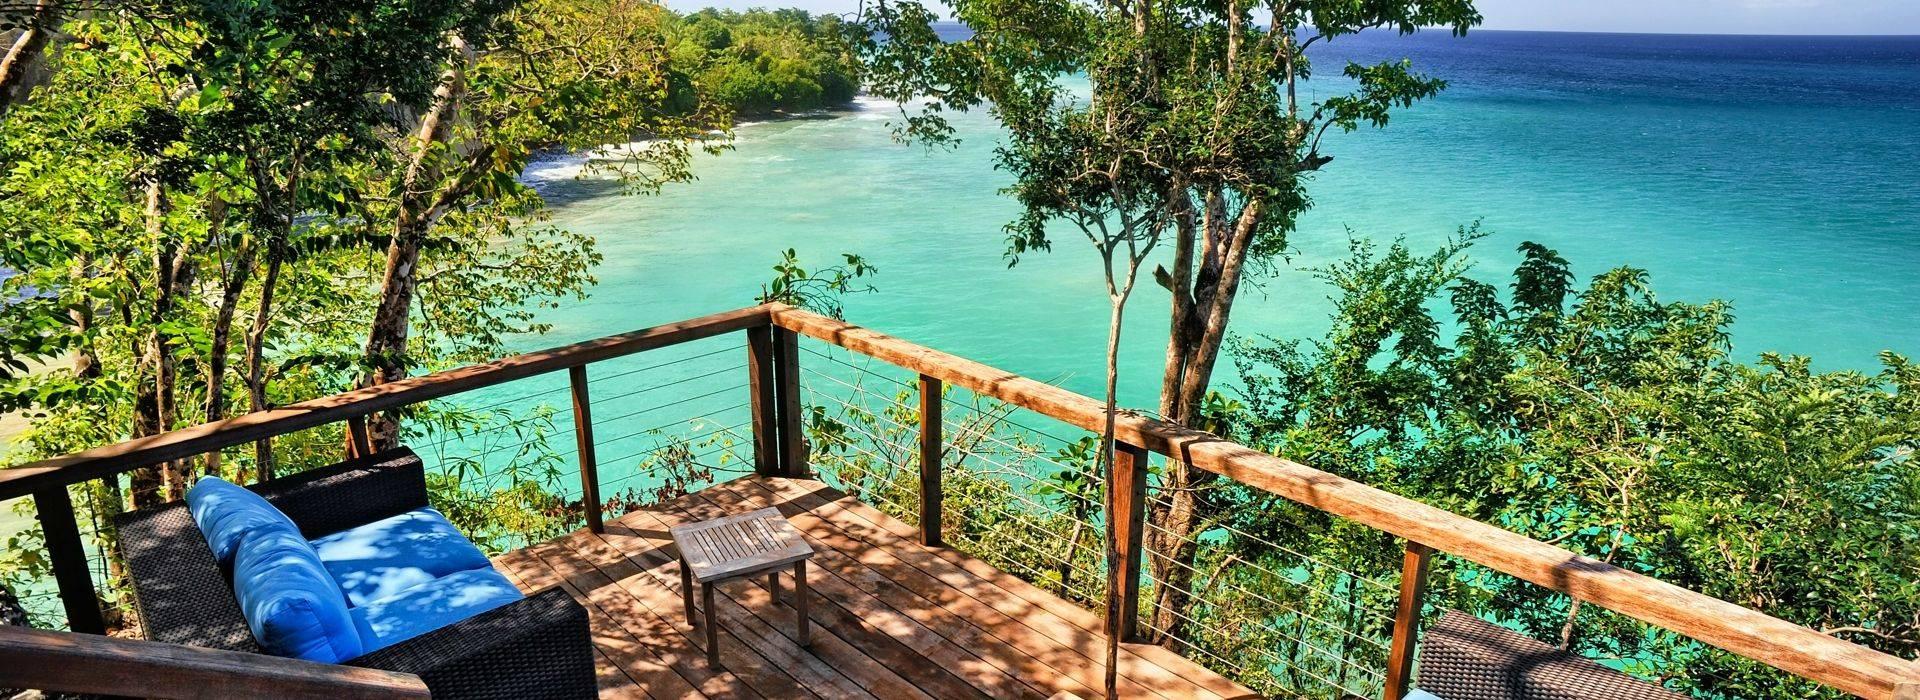 Caribbean Wellness Vacations